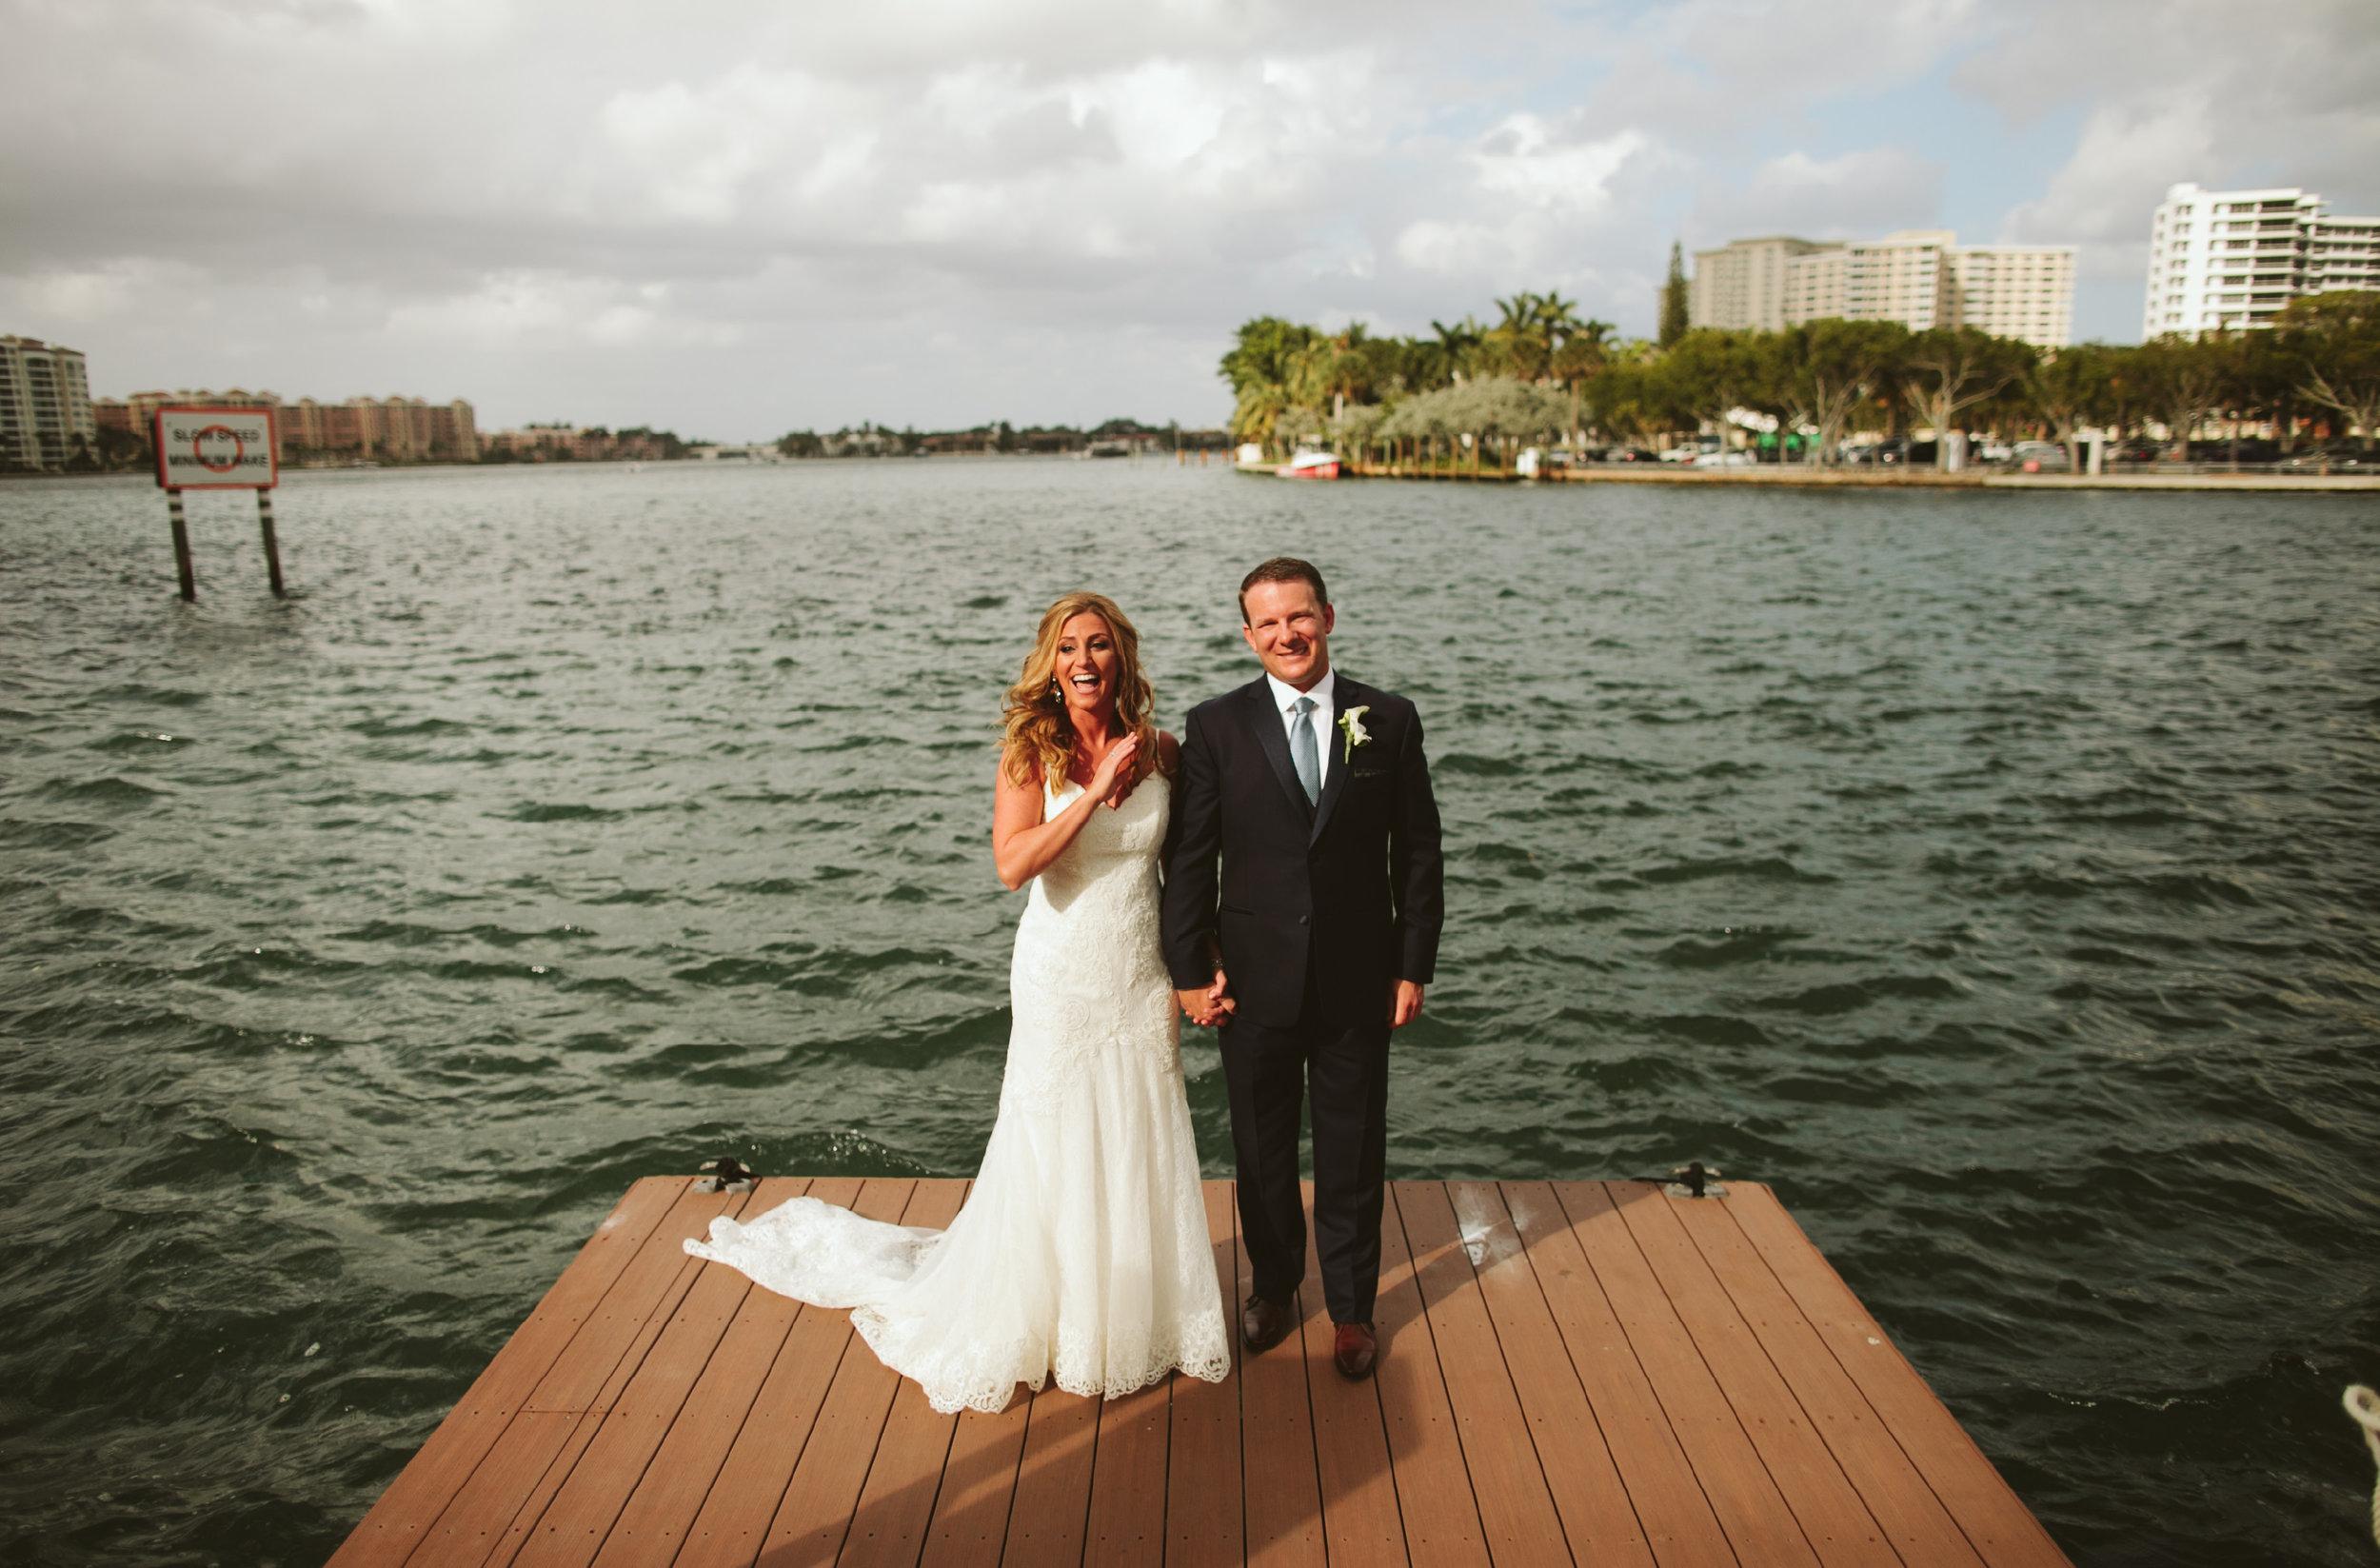 Kim + John's Wedding at the Waterstone Hotel in Boca Raton39.jpg